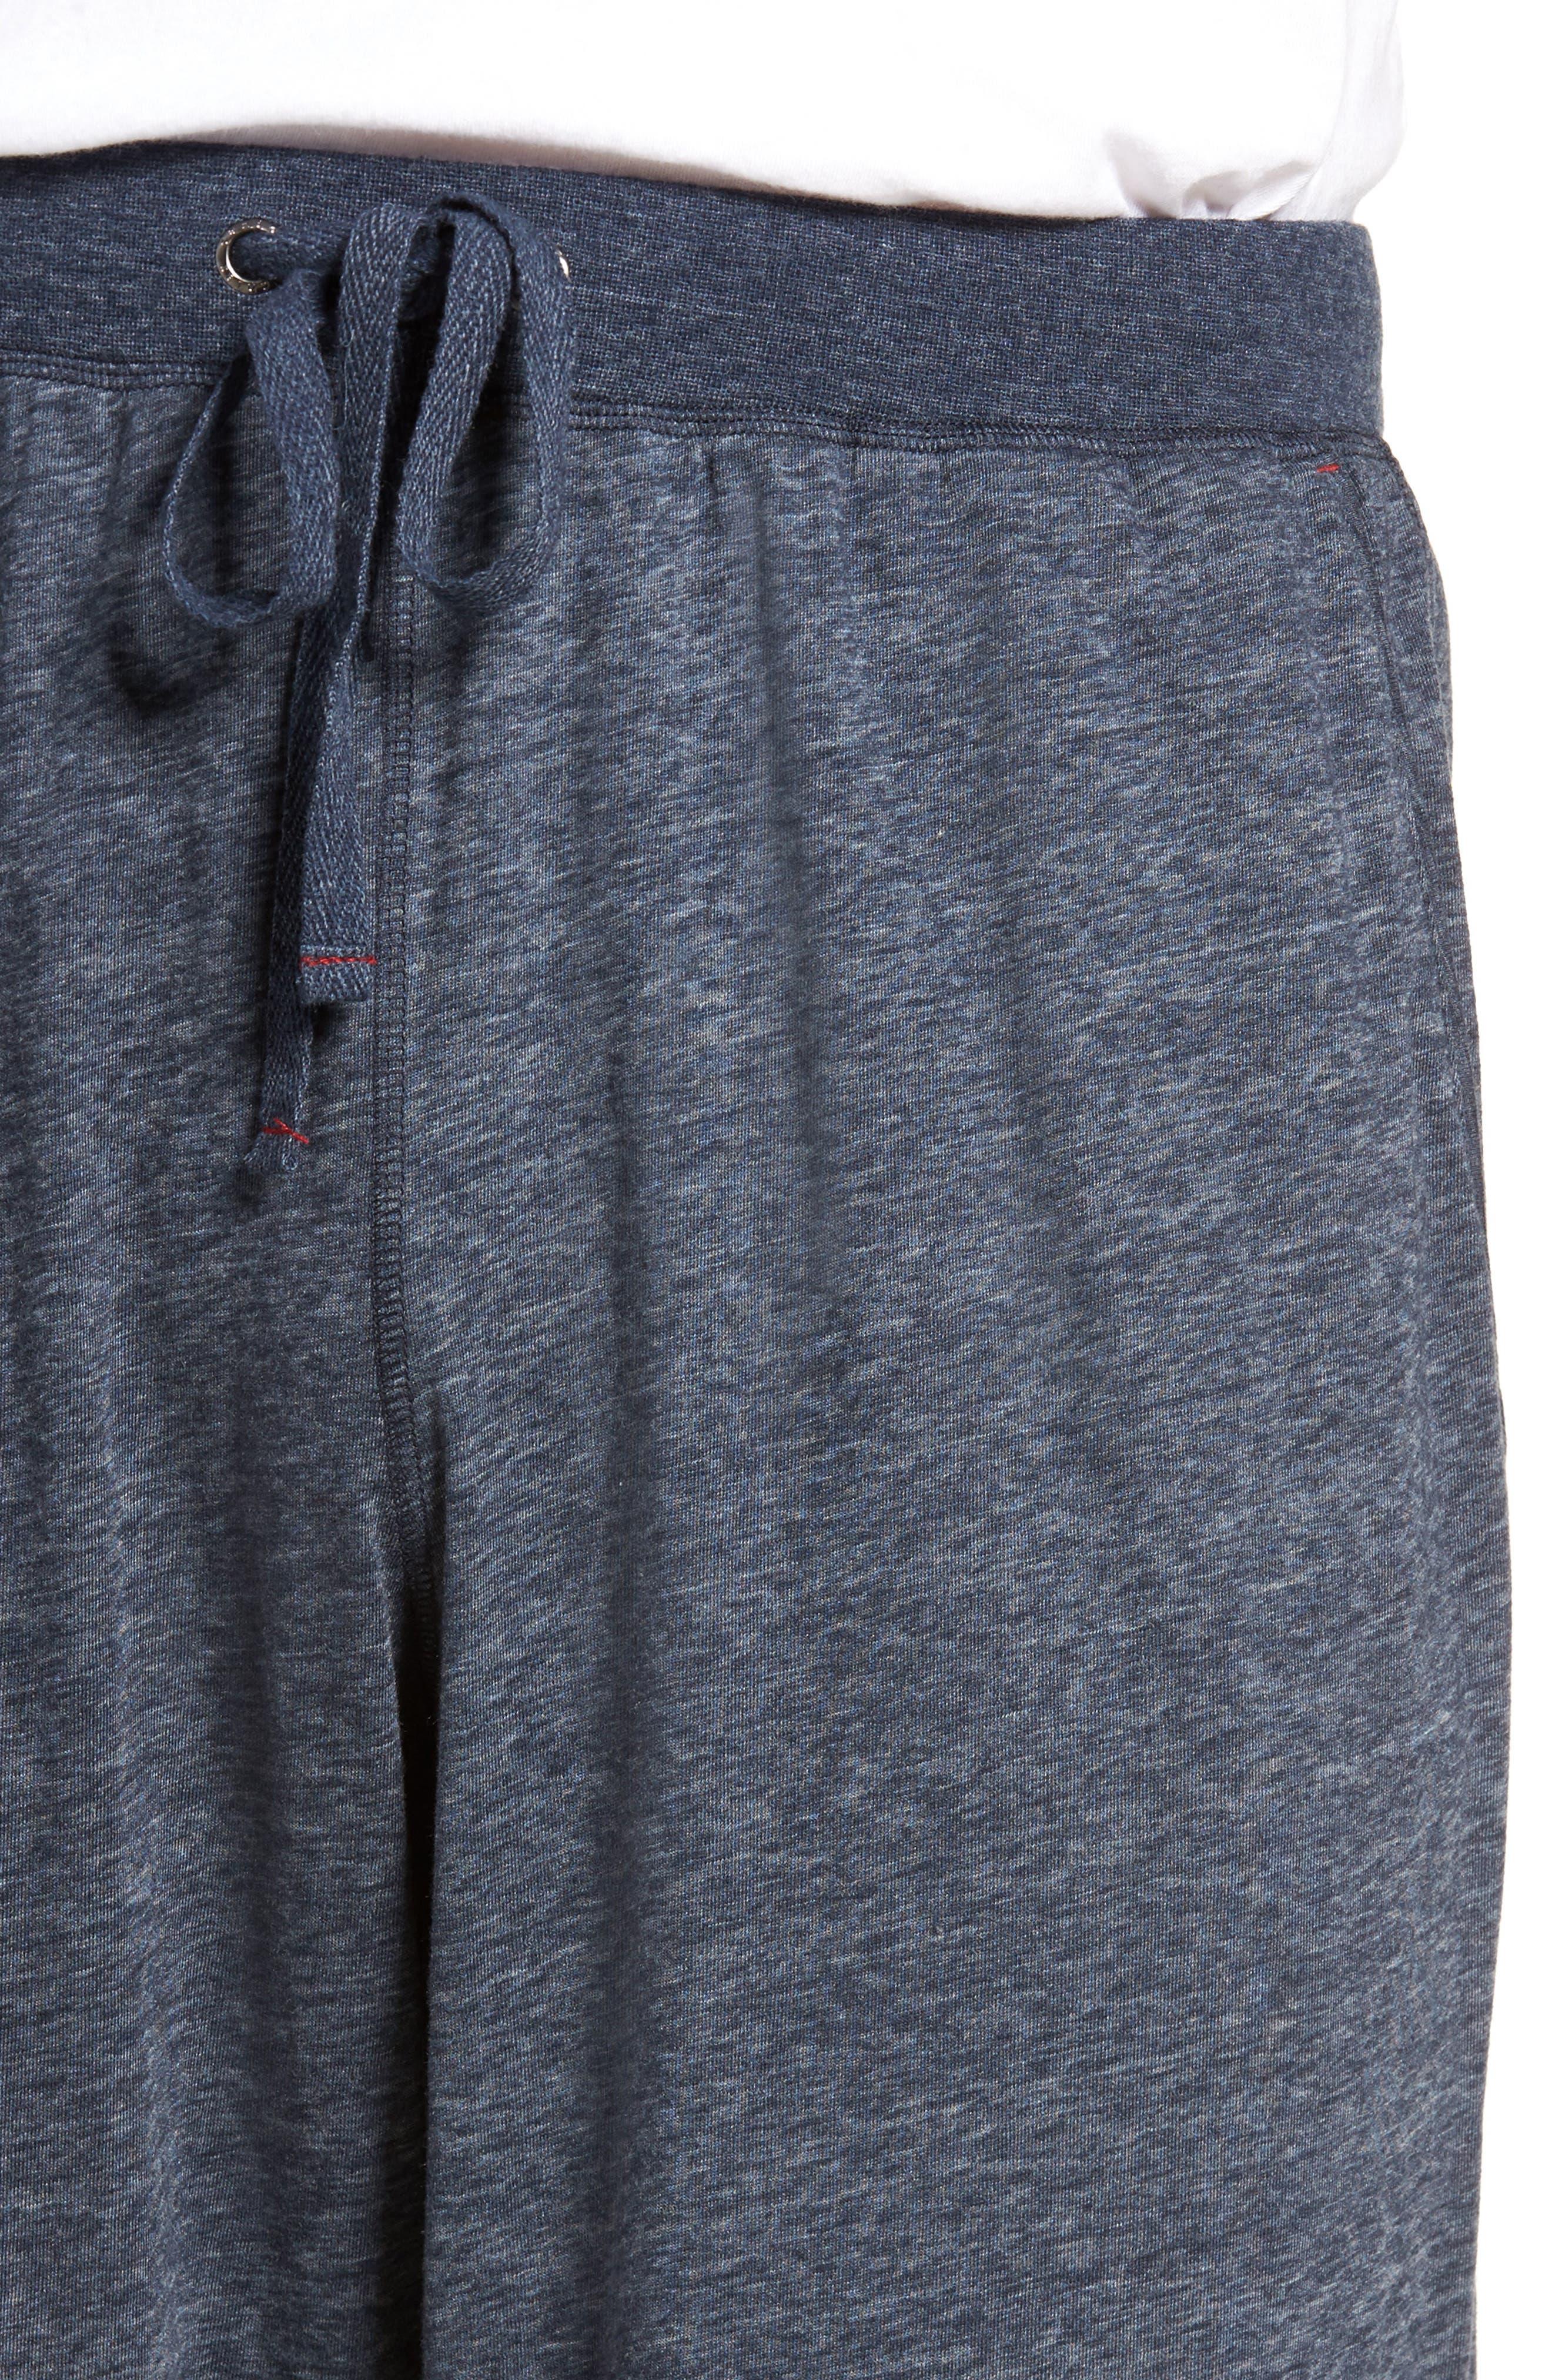 Alternate Image 4  - Daniel Buchler Recycled Cotton Blend Lounge Pants